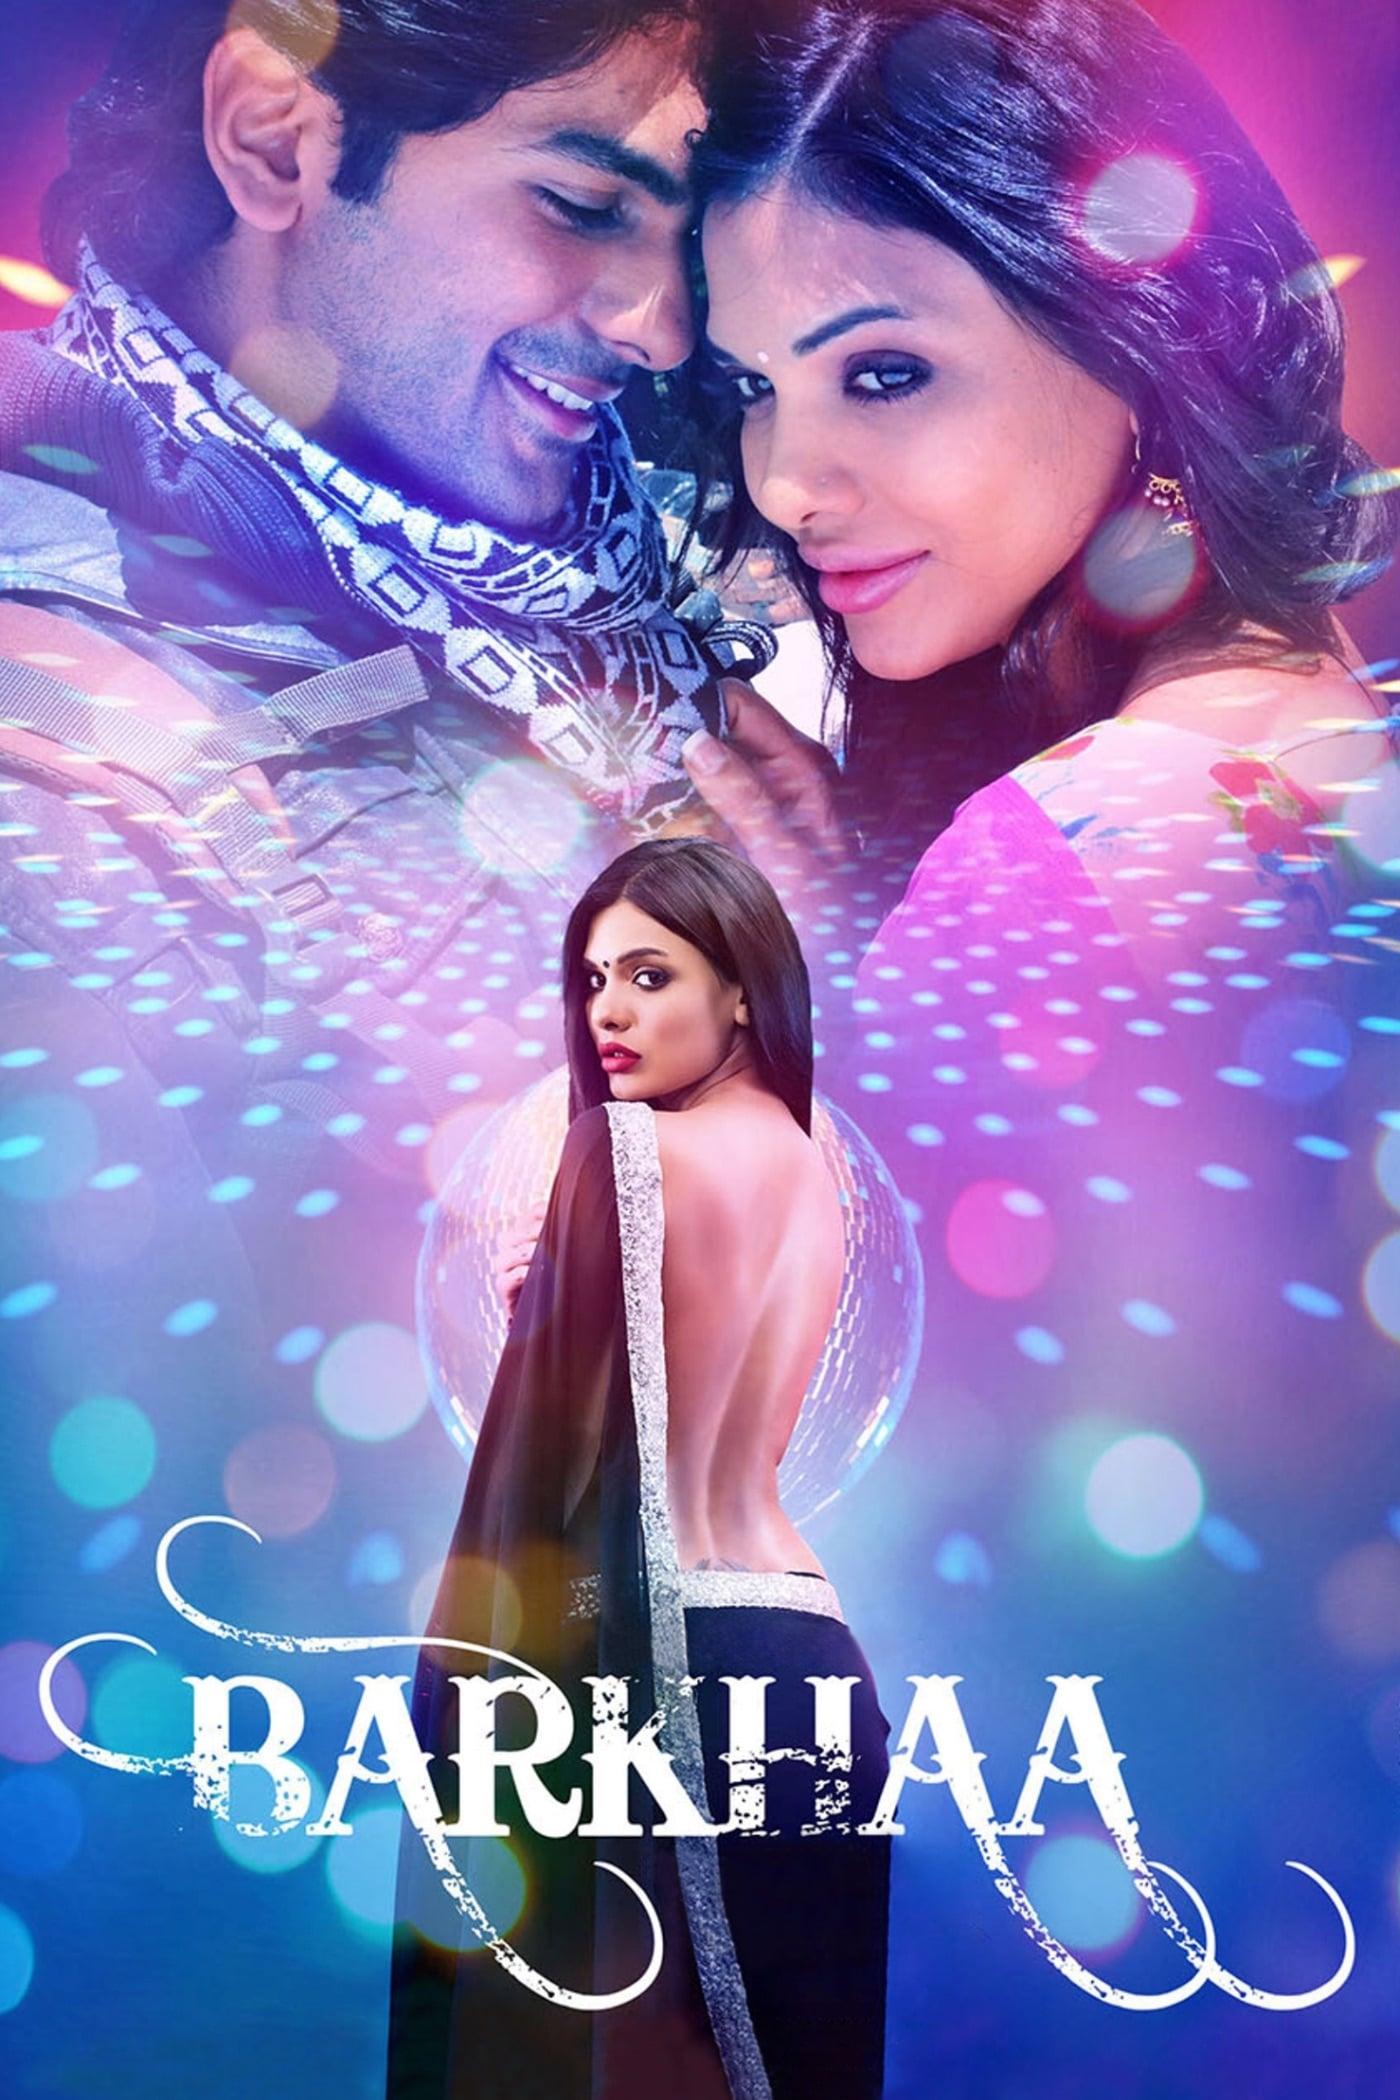 Barkhaa on FREECABLE TV